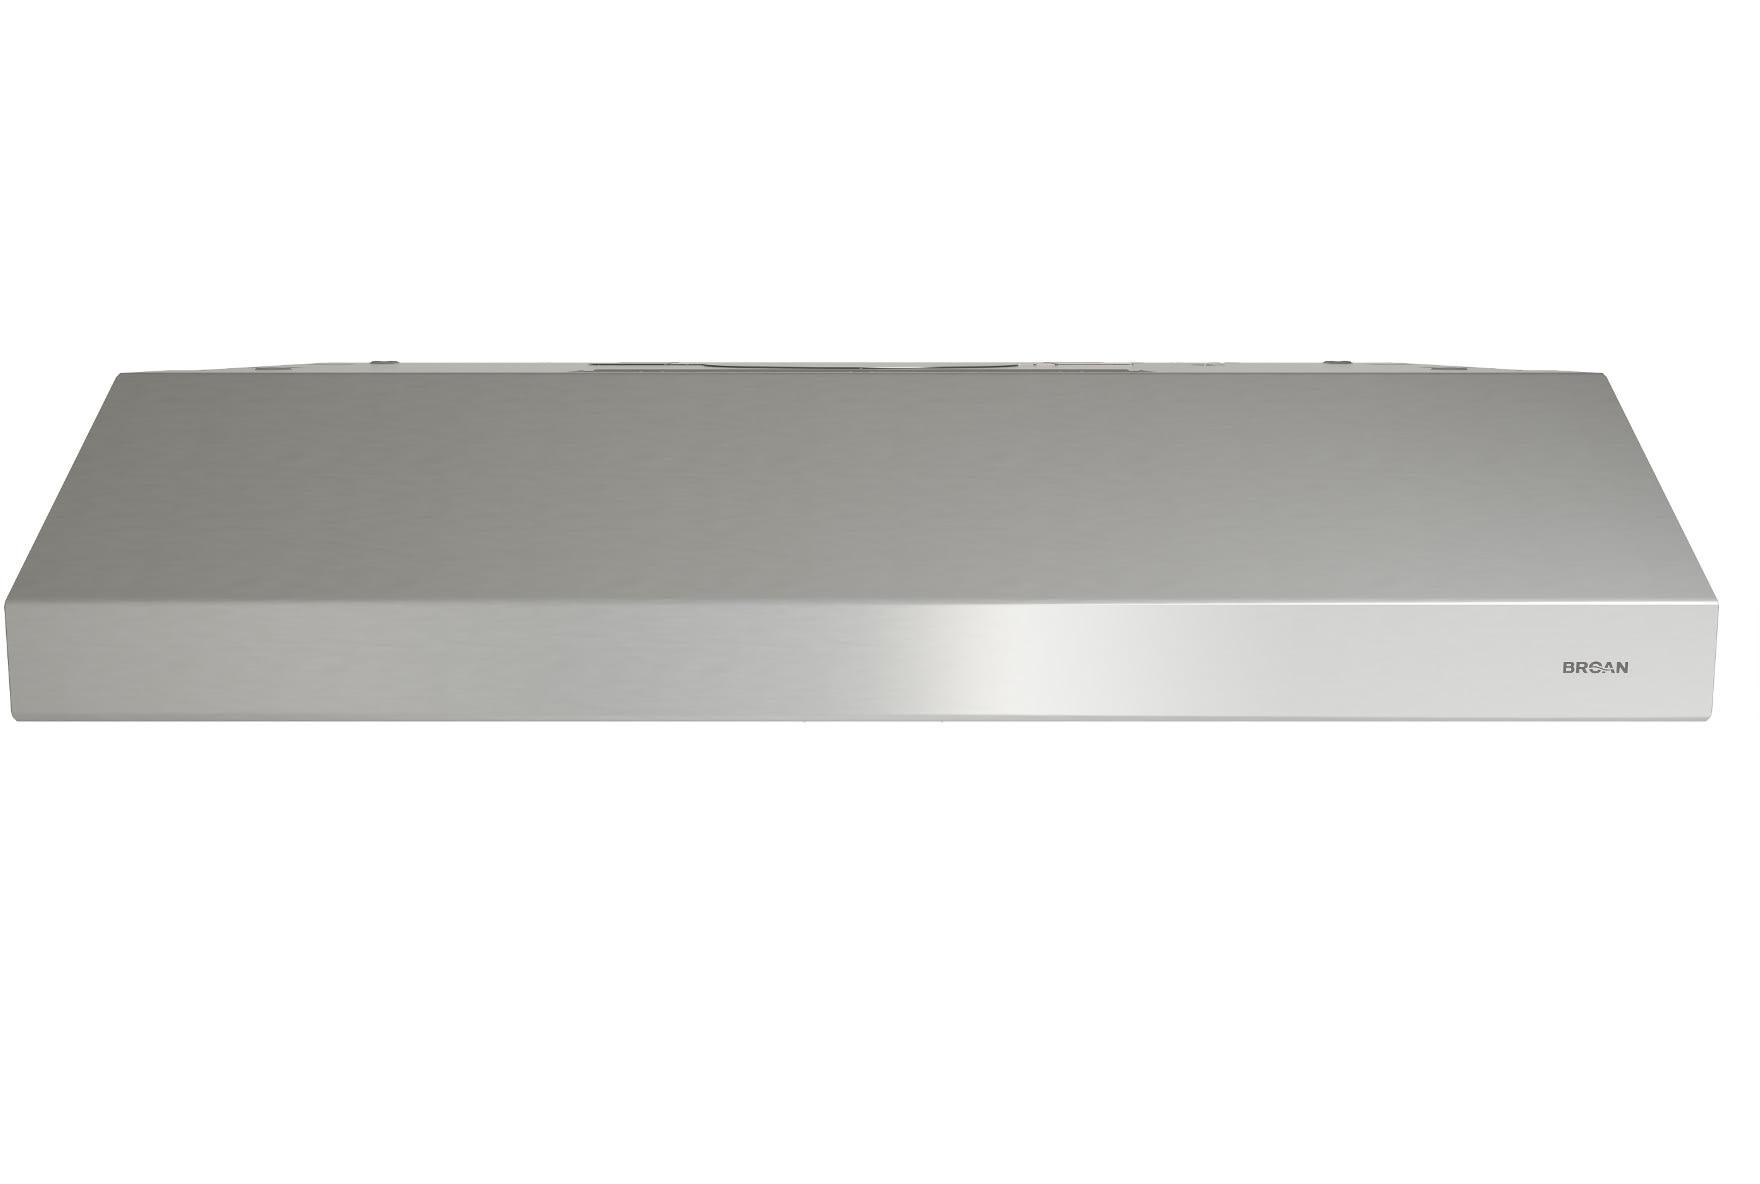 Broan Bcsek130ss 30 Inch Under Cabinet Range Hood With